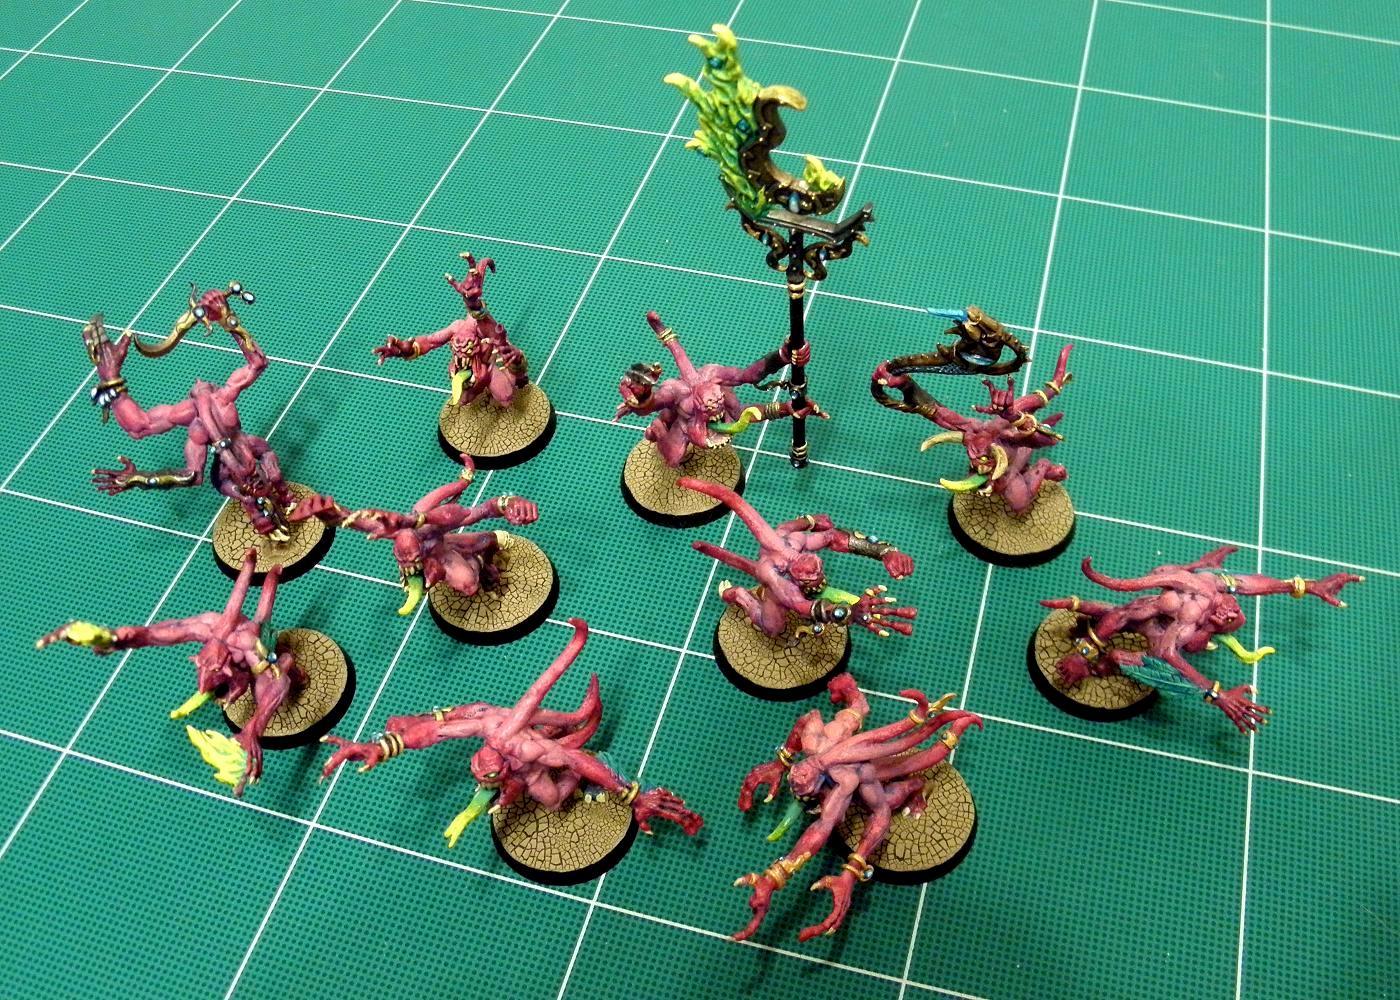 Agrellan Earth, Chaos, Chaos Daemons, Chaos Space Marines, Daemons, Desert, Horrors, Pink Horros, Tzeentch, Warhammer 40,000, Warhammer Fantasy